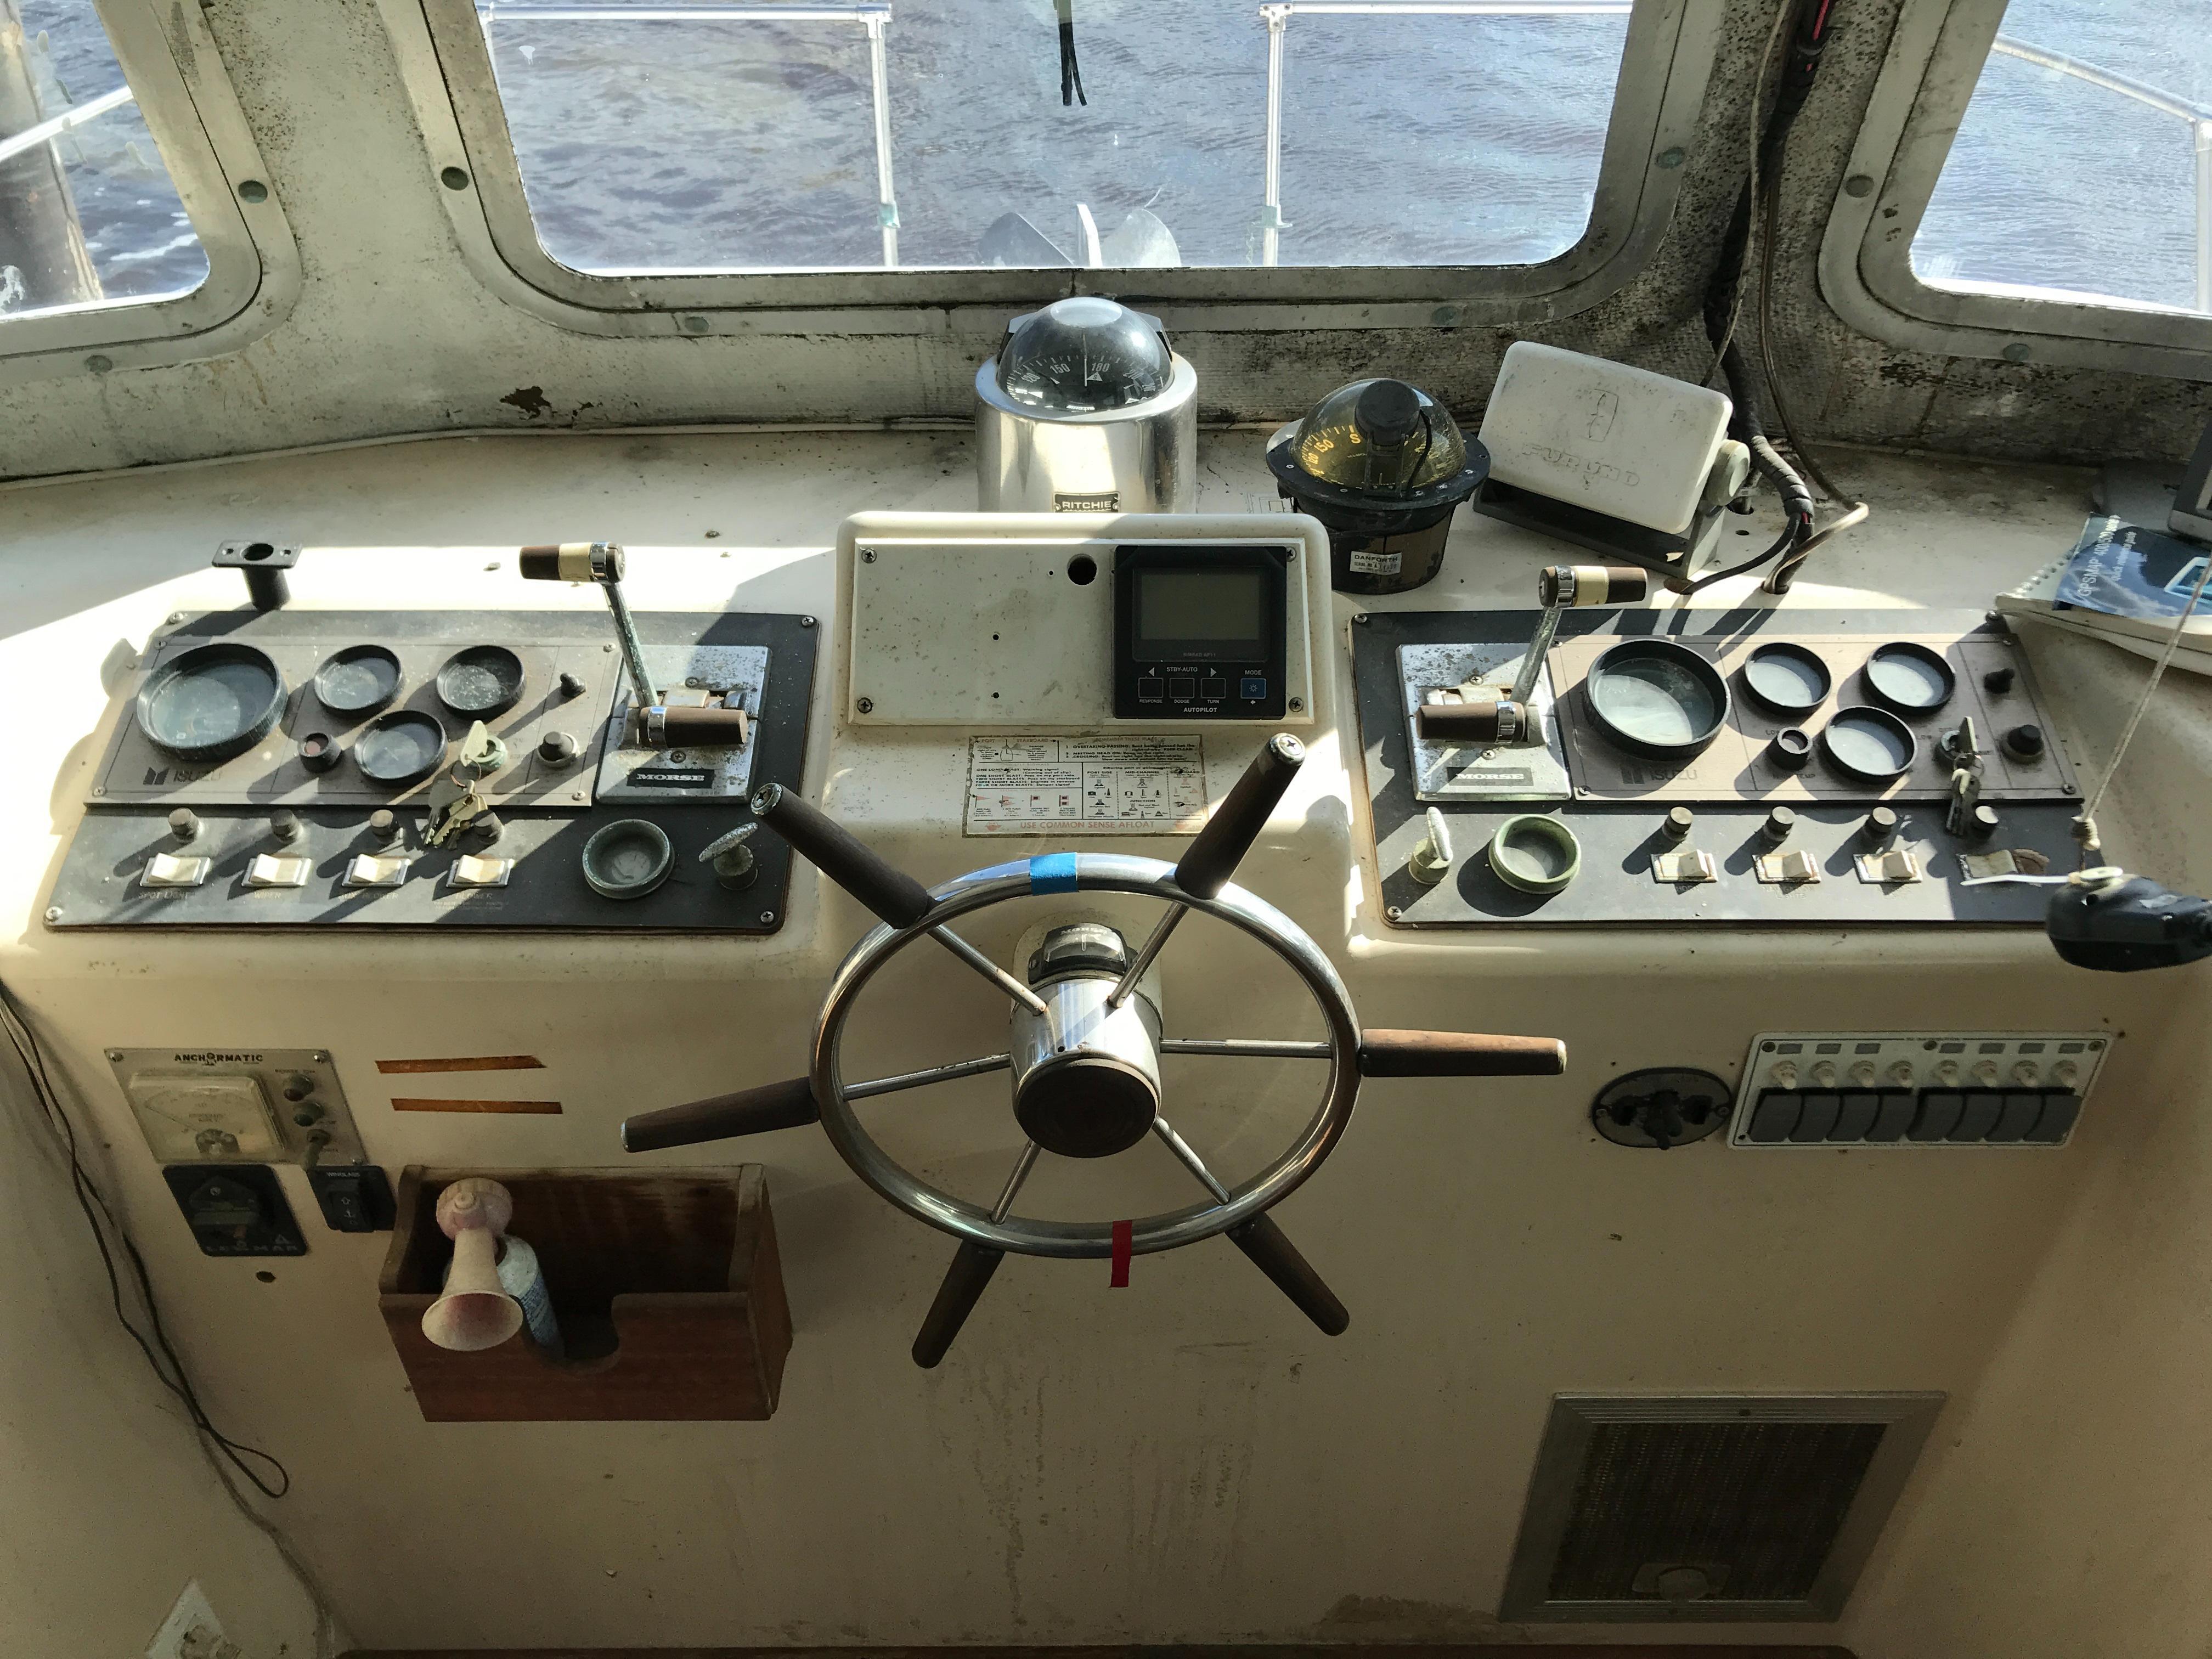 Carri-craft 57 Catamaran - lower helm station